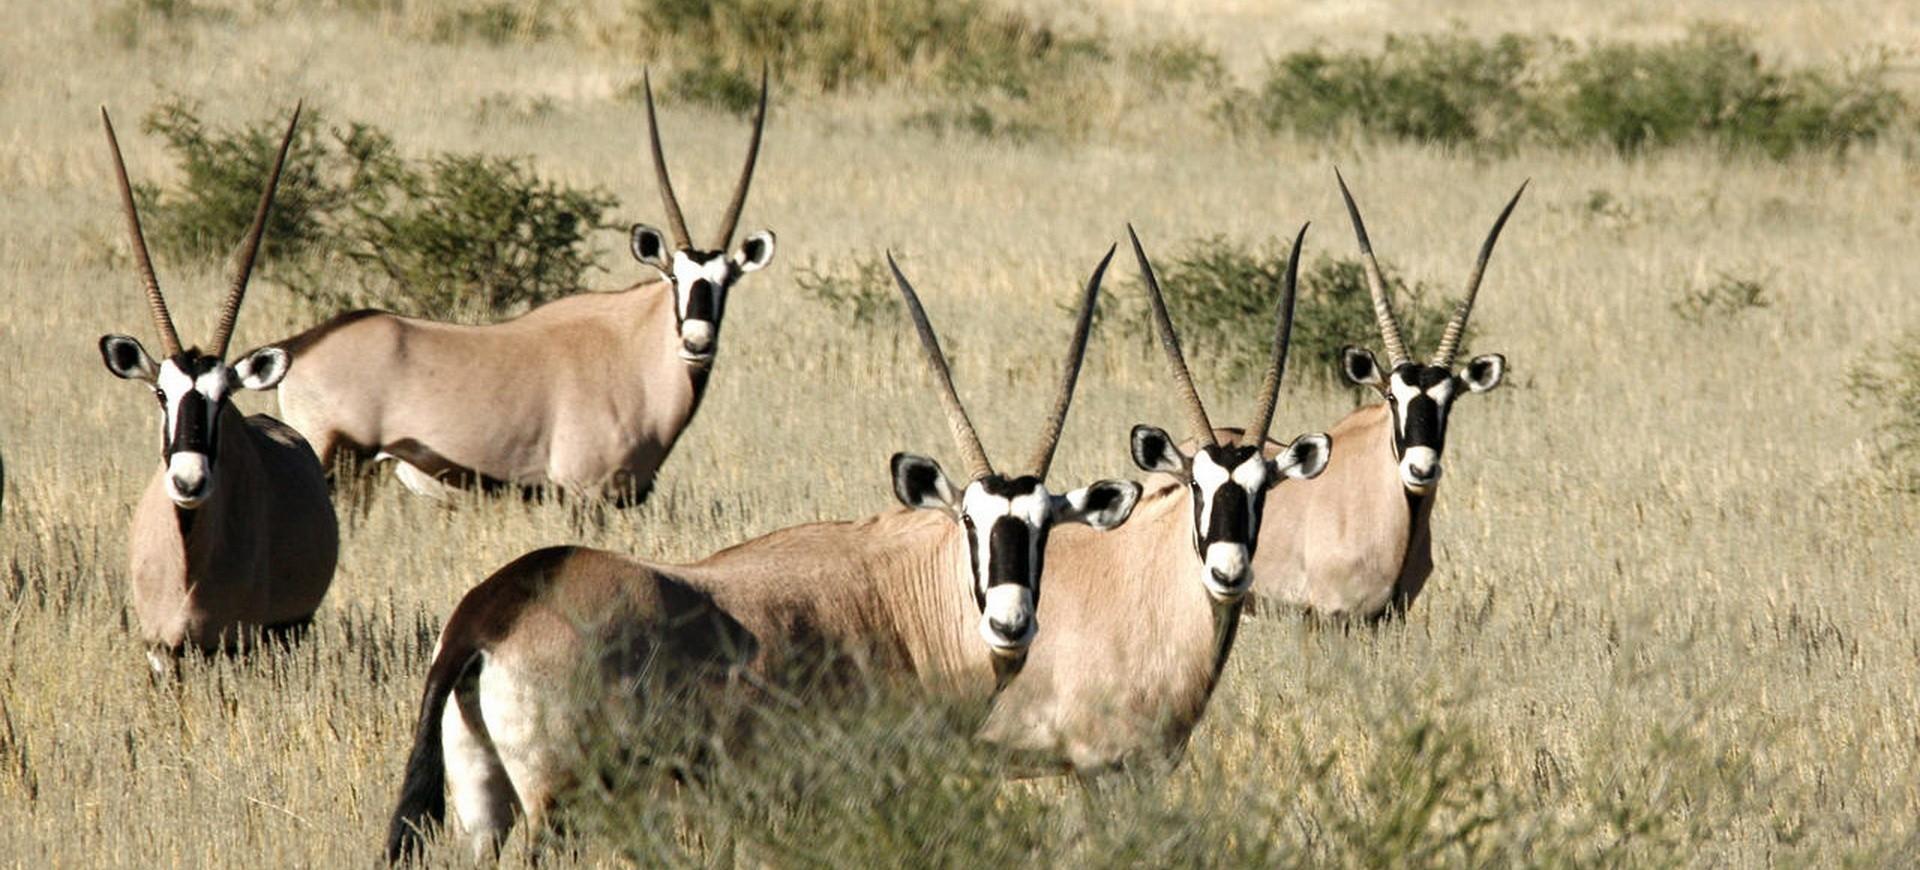 Namibie Parc national d'Etosha Gazelles